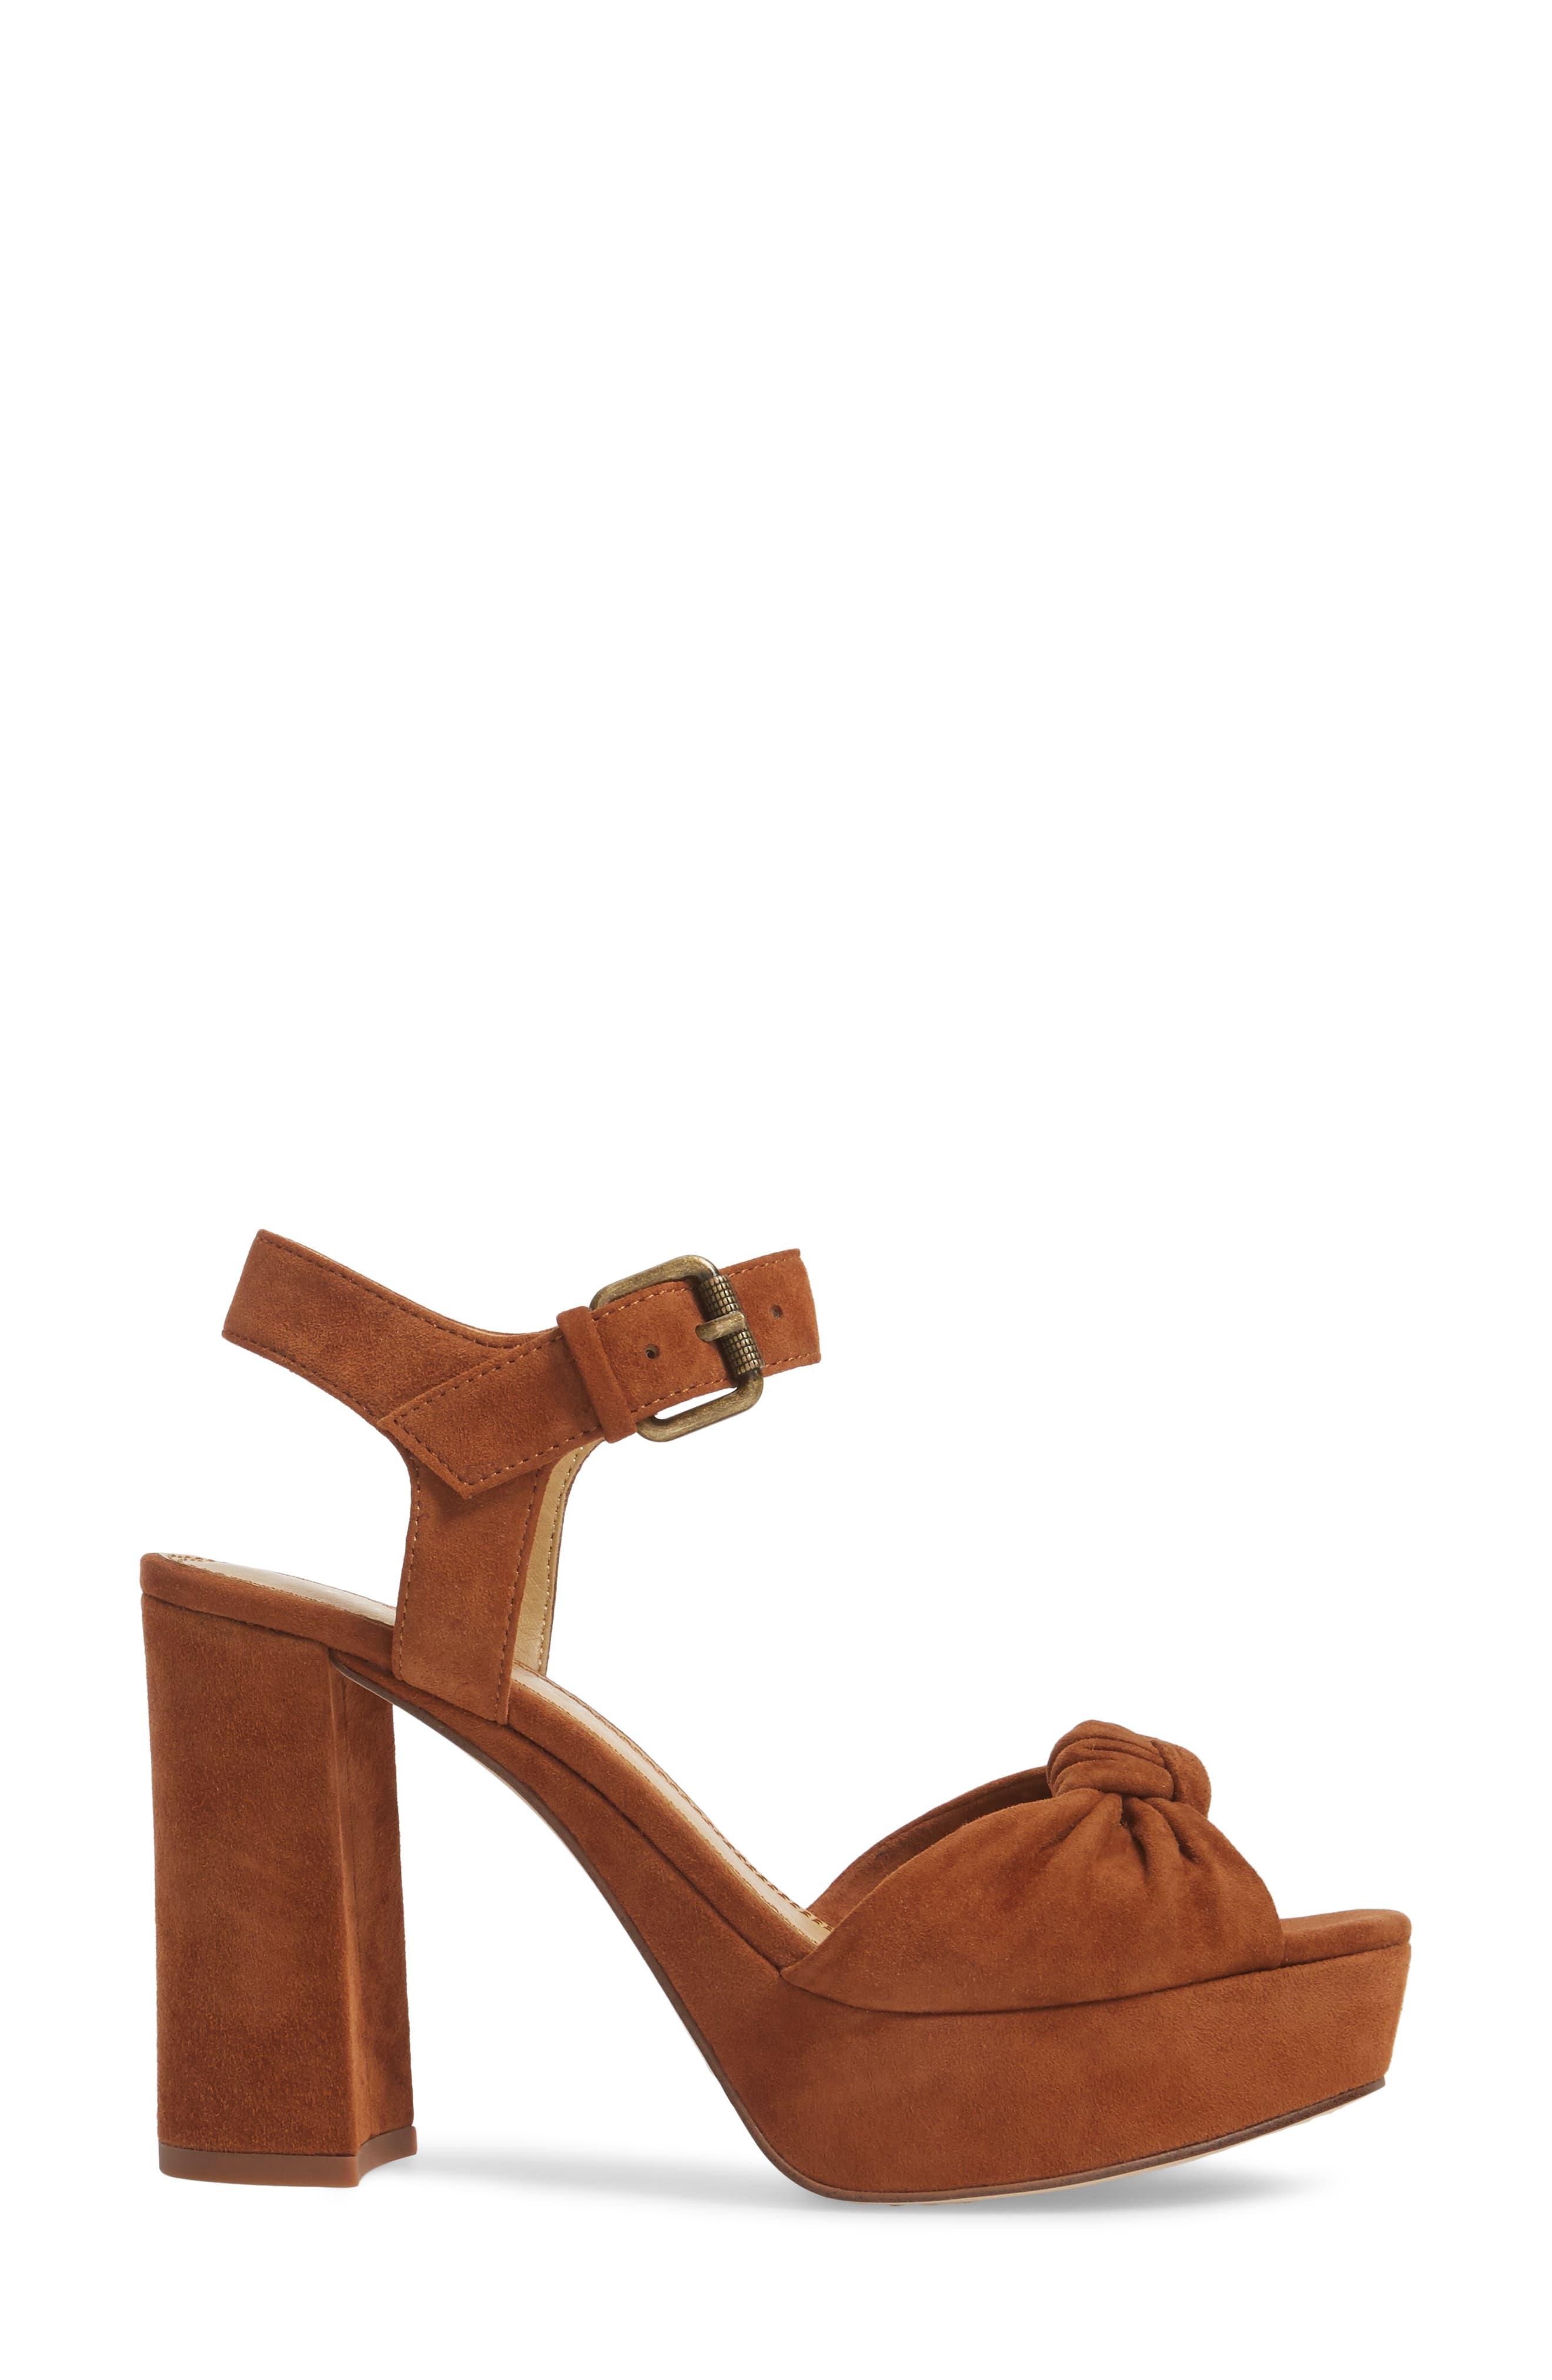 Bates Platform Sandal,                             Alternate thumbnail 3, color,                             Caramel Suede